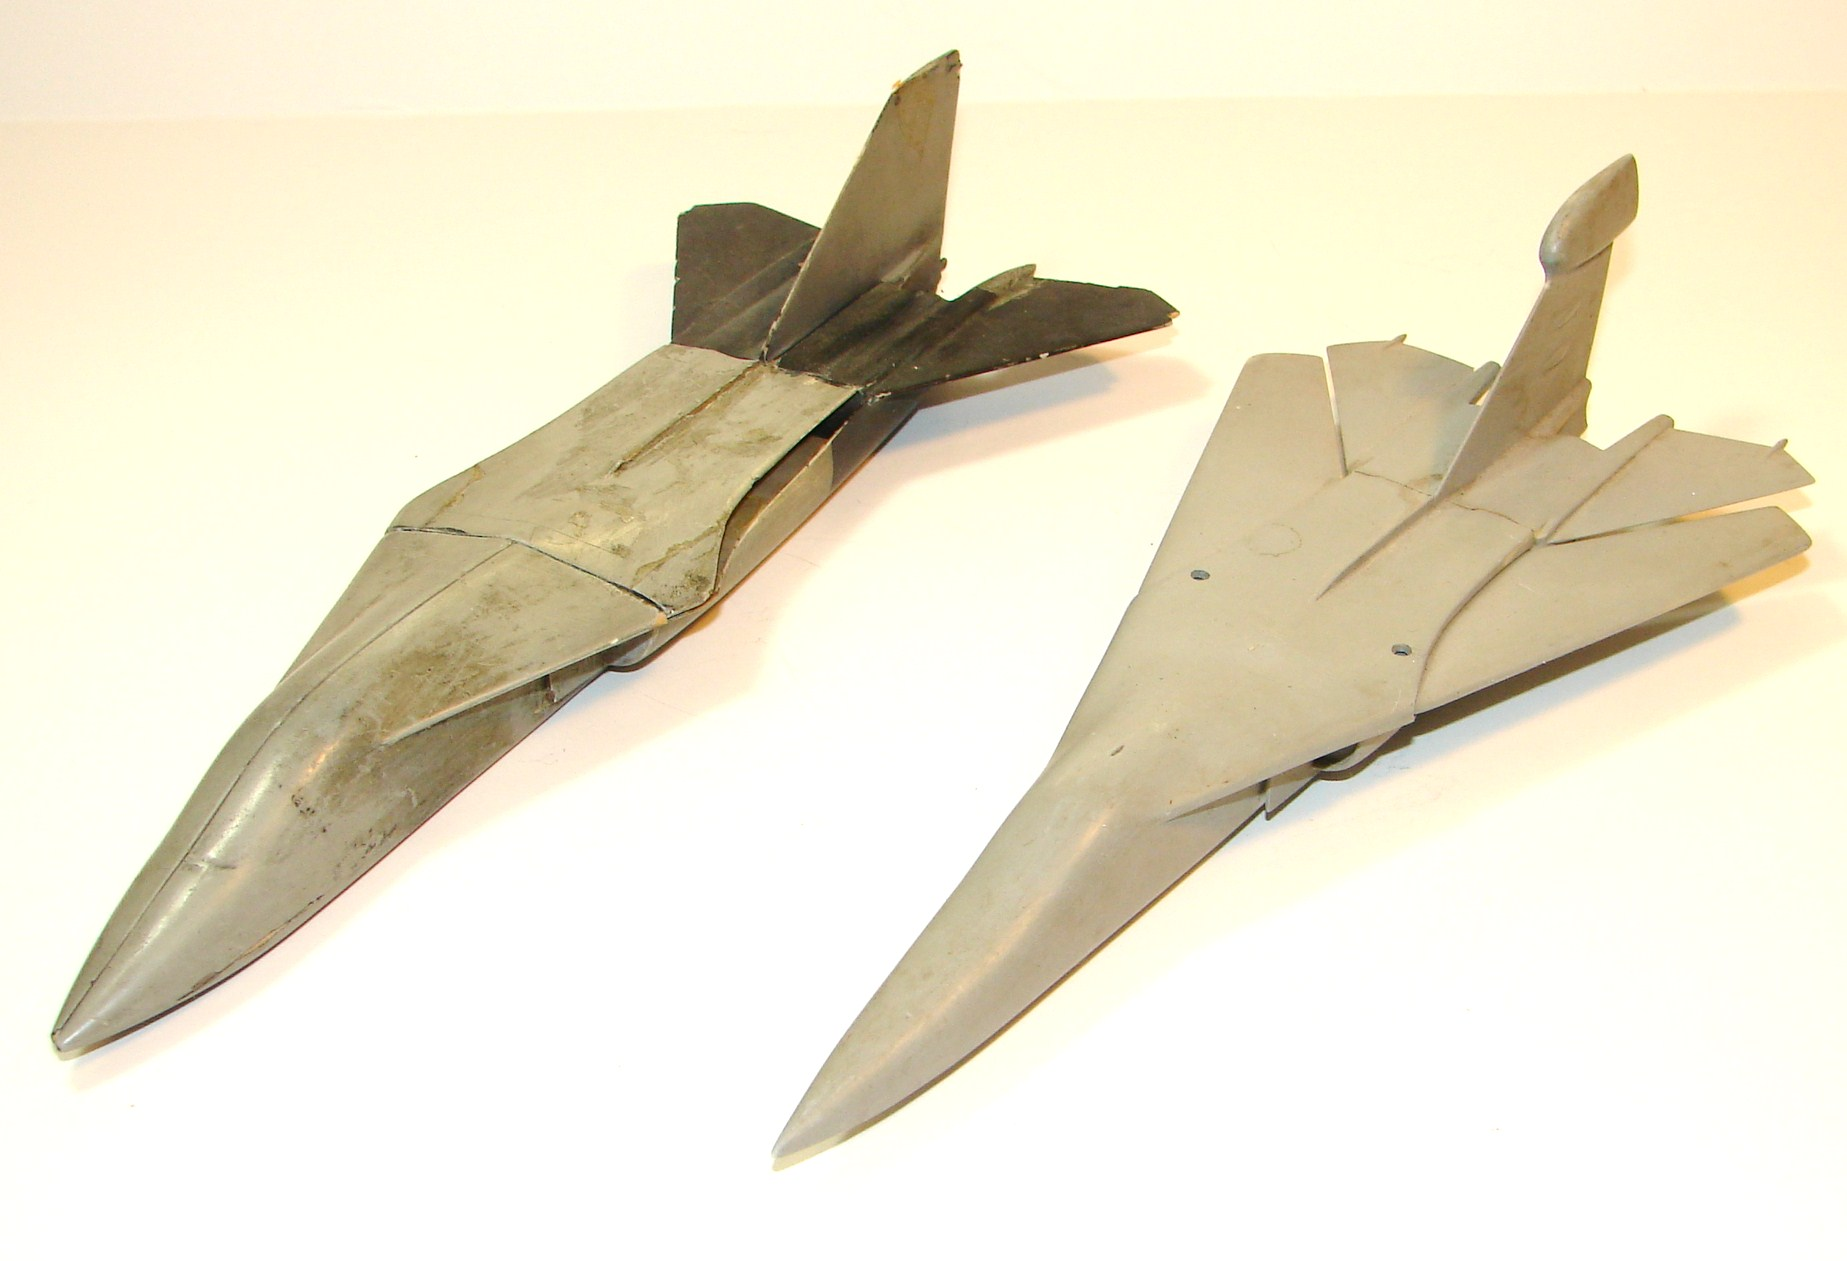 Master Models General Dynamics F-111